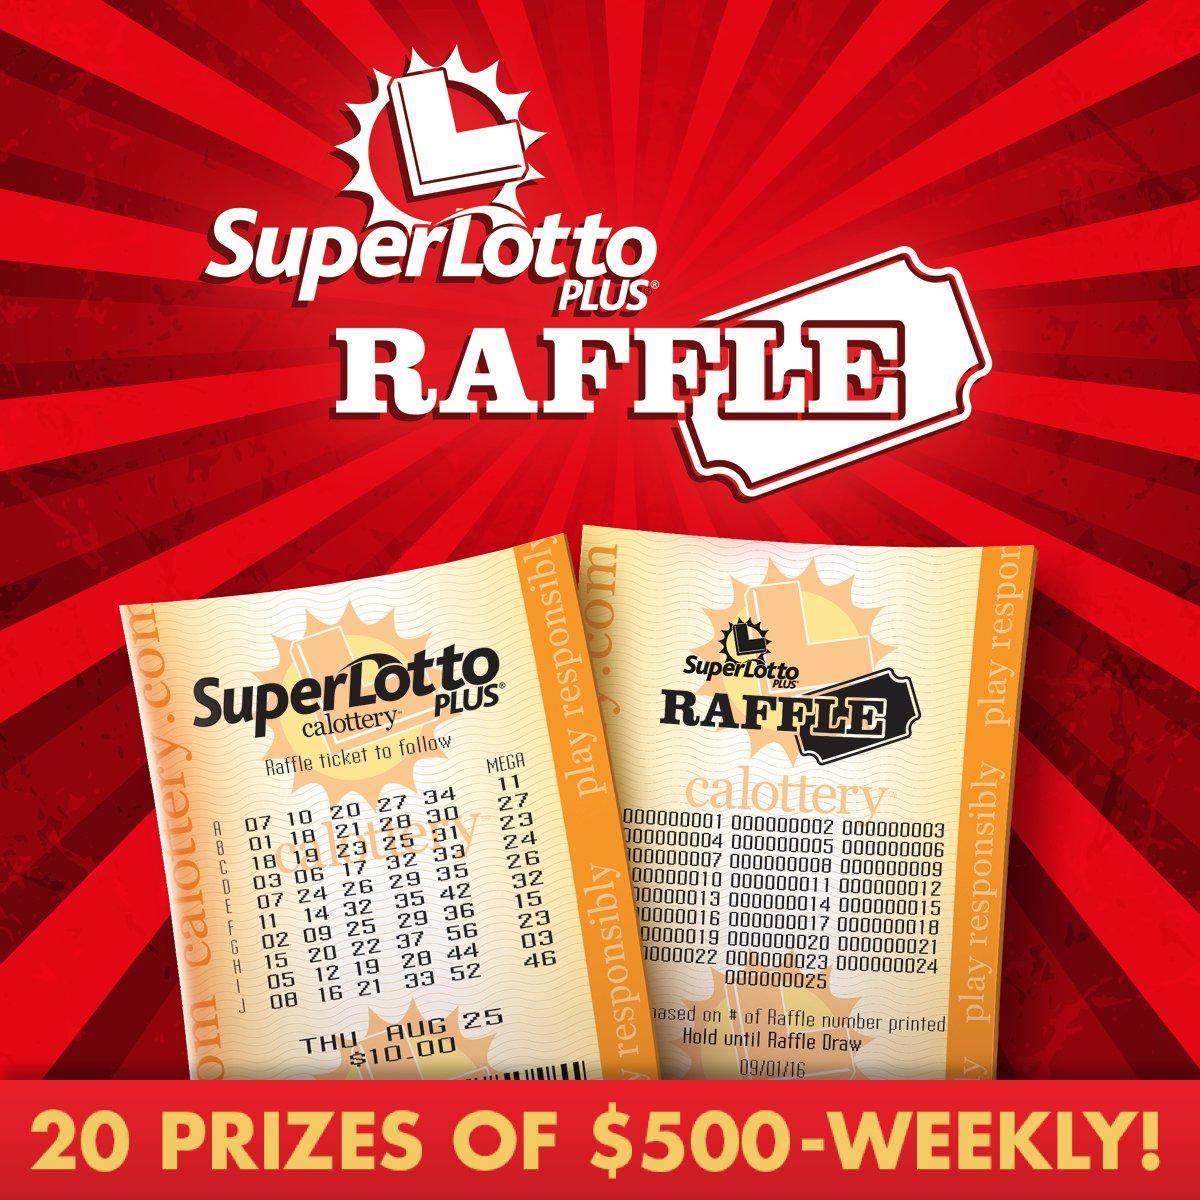 California Lottery on Twitter: